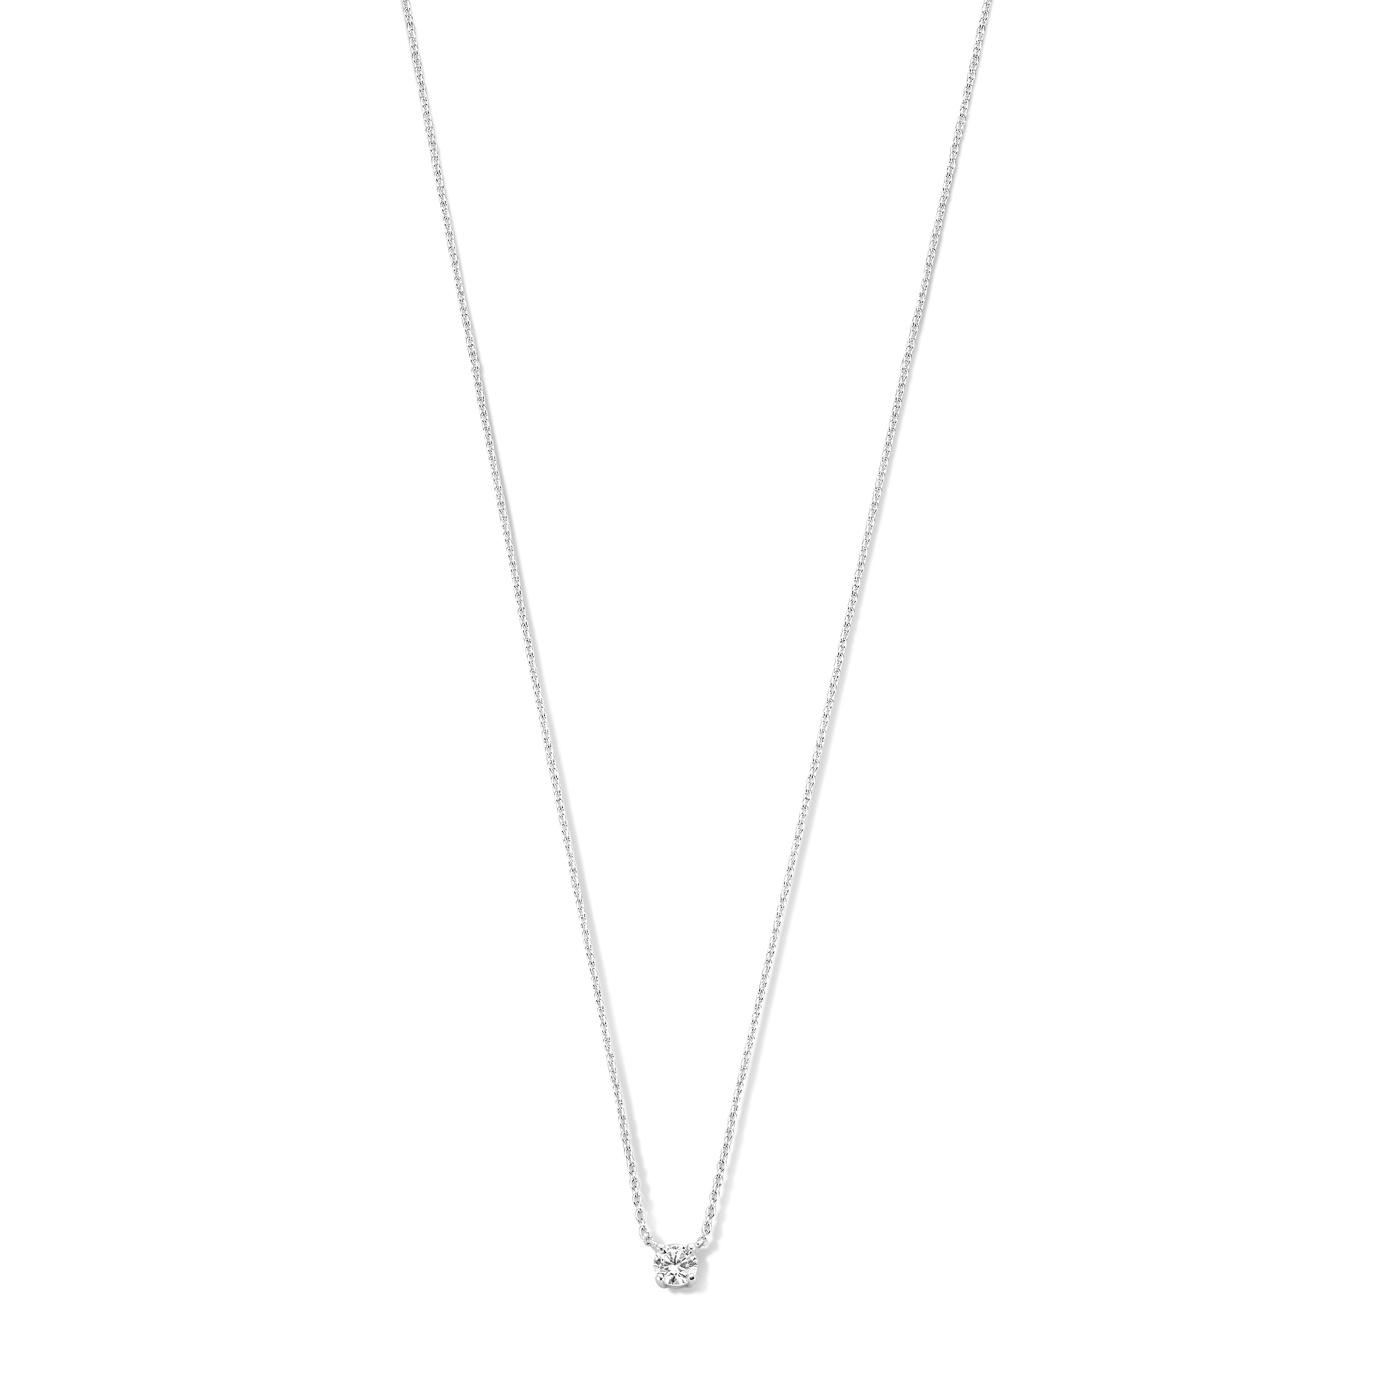 Isabel Bernard Collier Saint Germain Hélione en or blanc 14 carats zircone